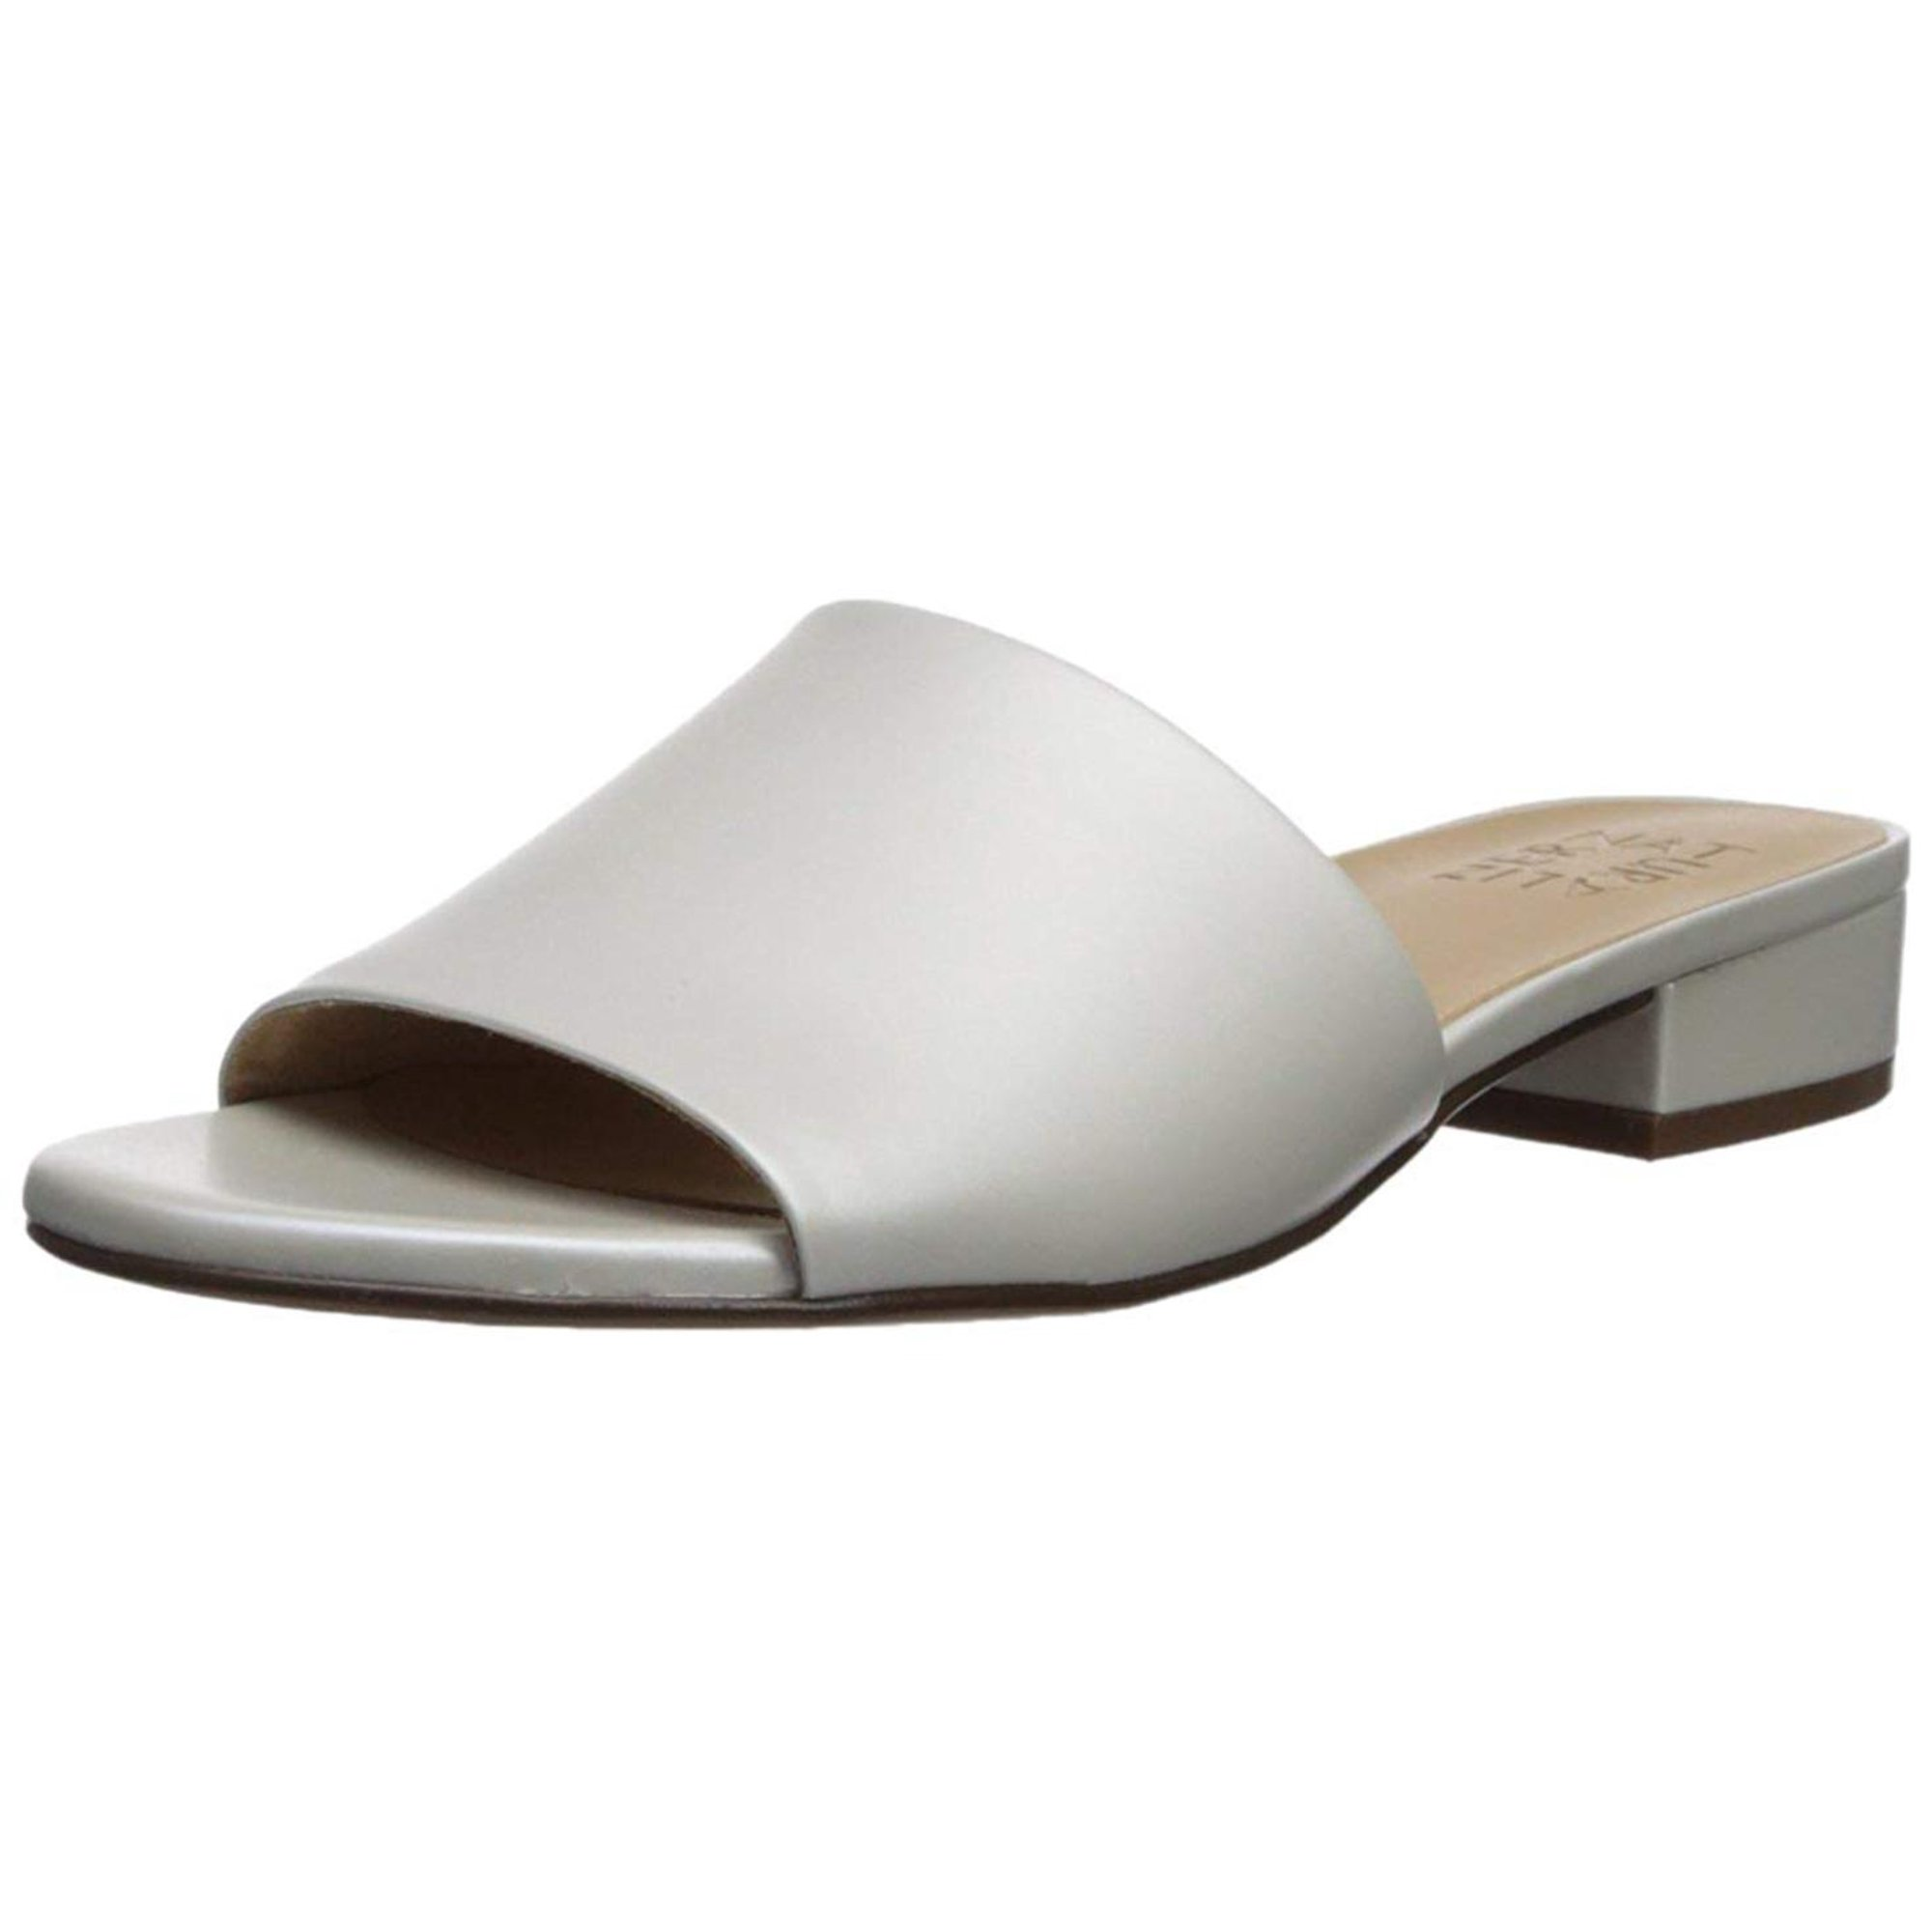 98f86a13b7ec Naturalizer Womens Mason Leather Open Toe Casual Slide Sandals ...